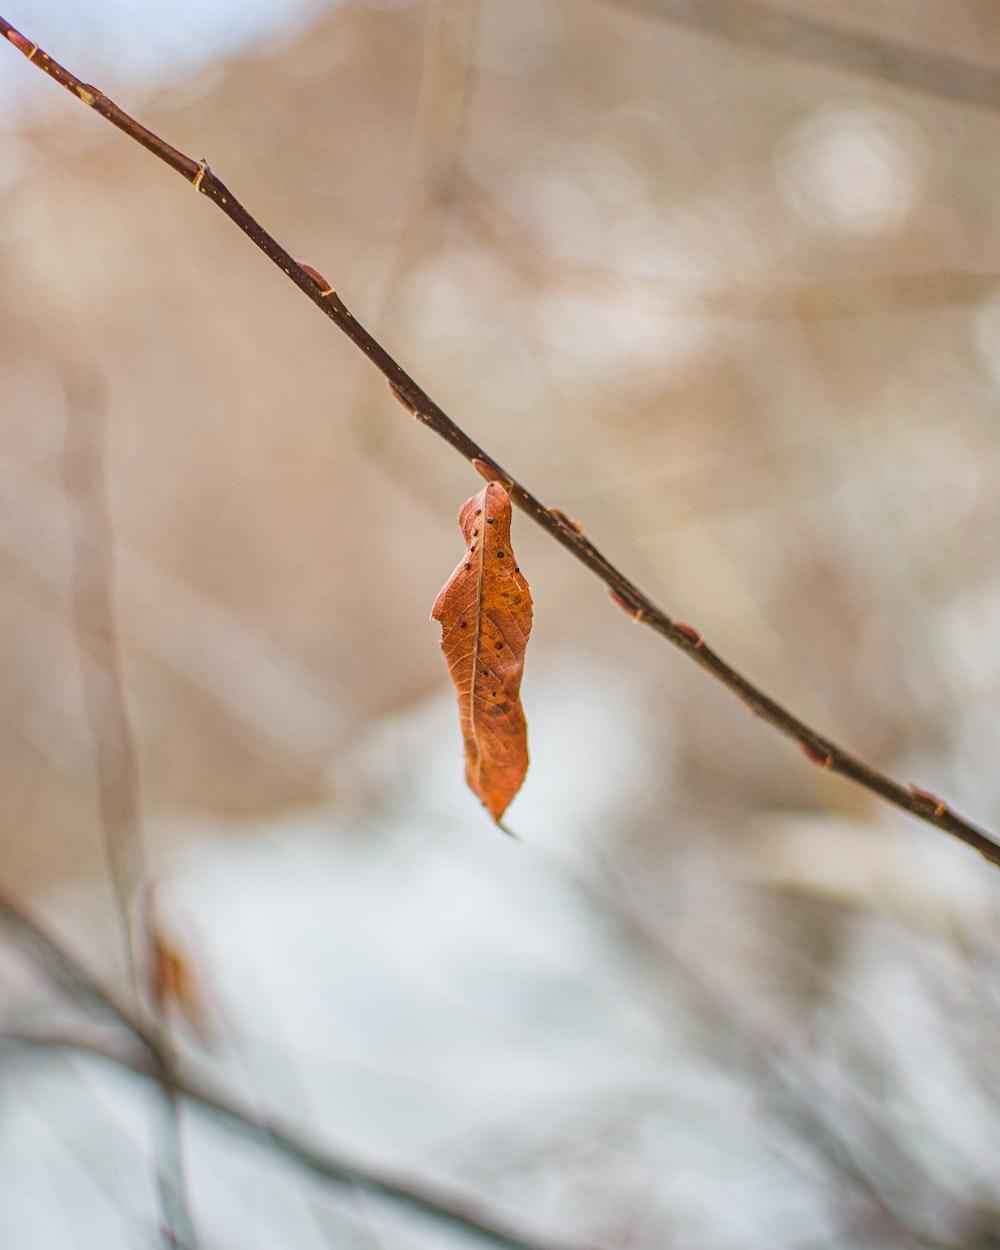 red and brown leaf on brown stem